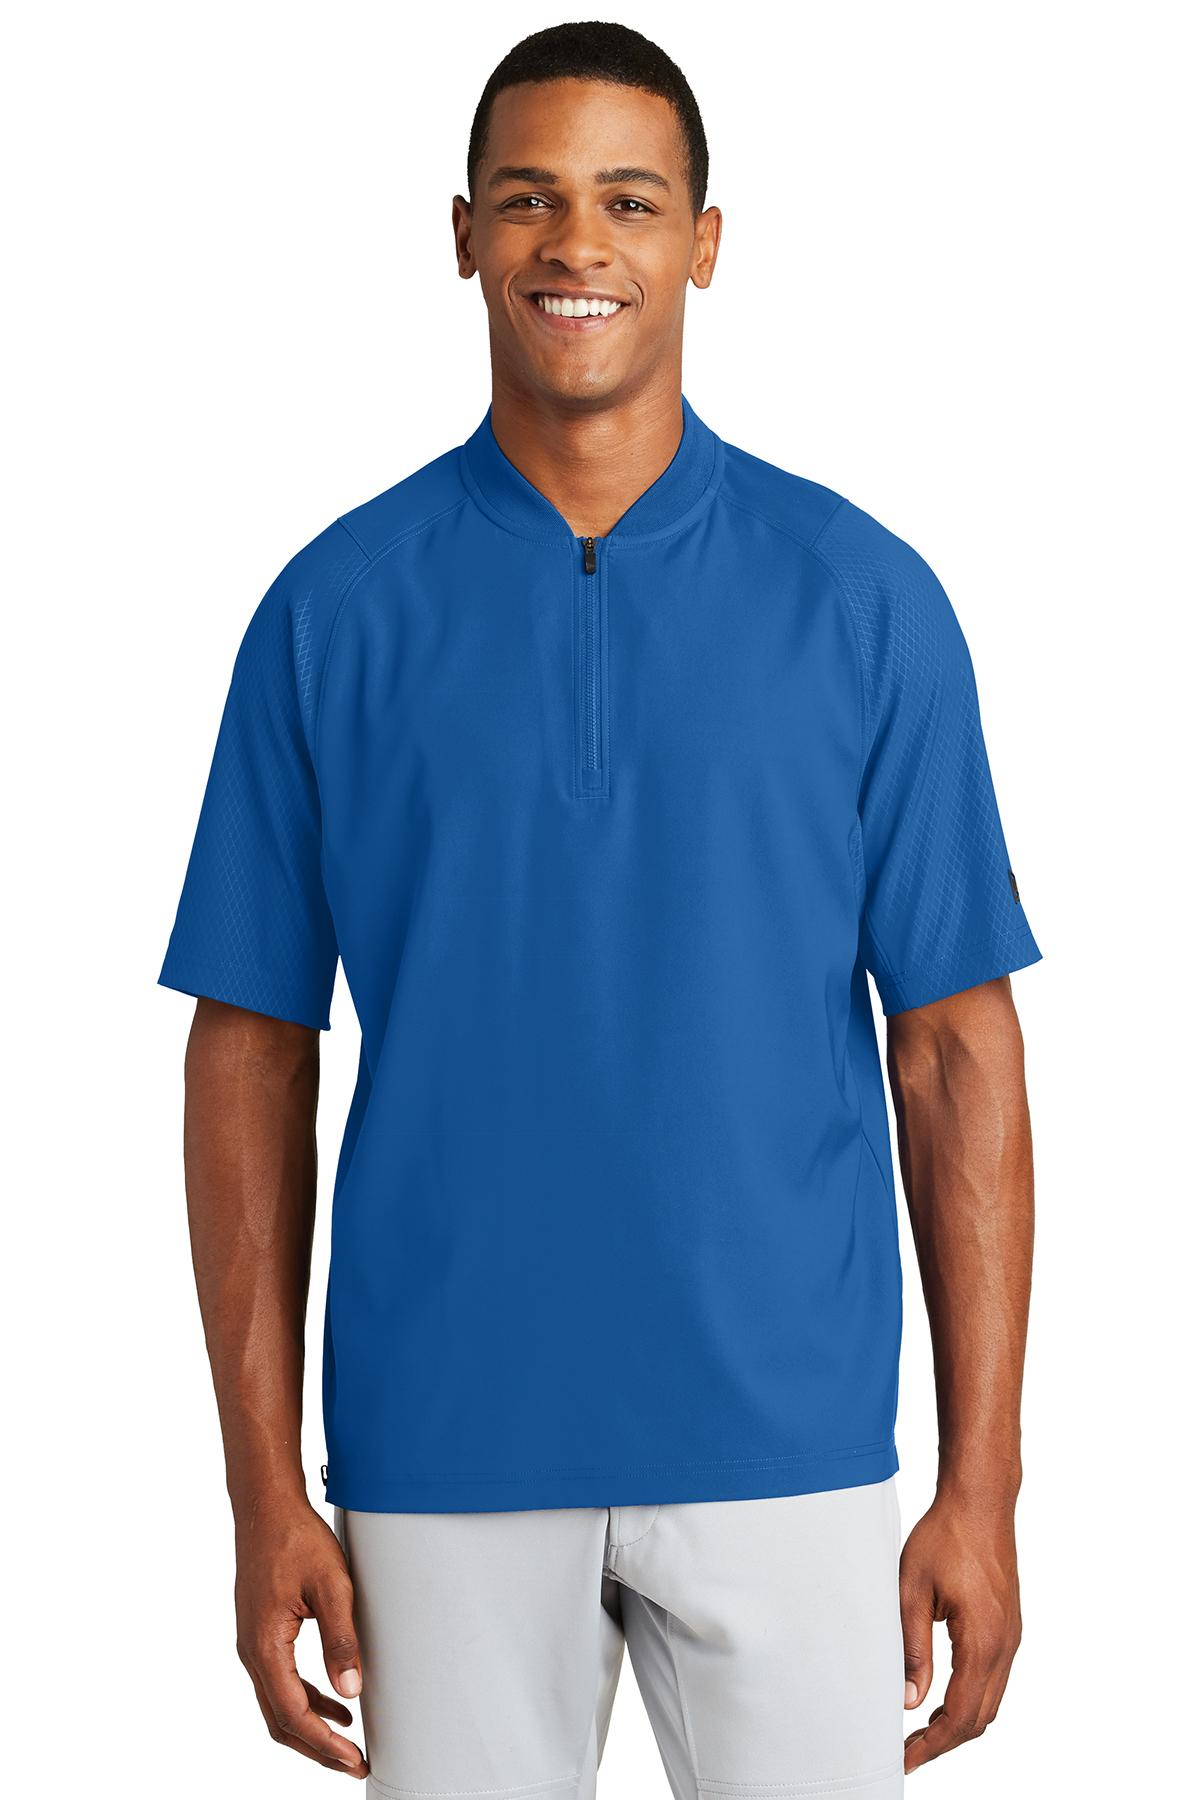 New Era NEA600 - Men's Cage Short Sleeve 1/4 Zip Jacket